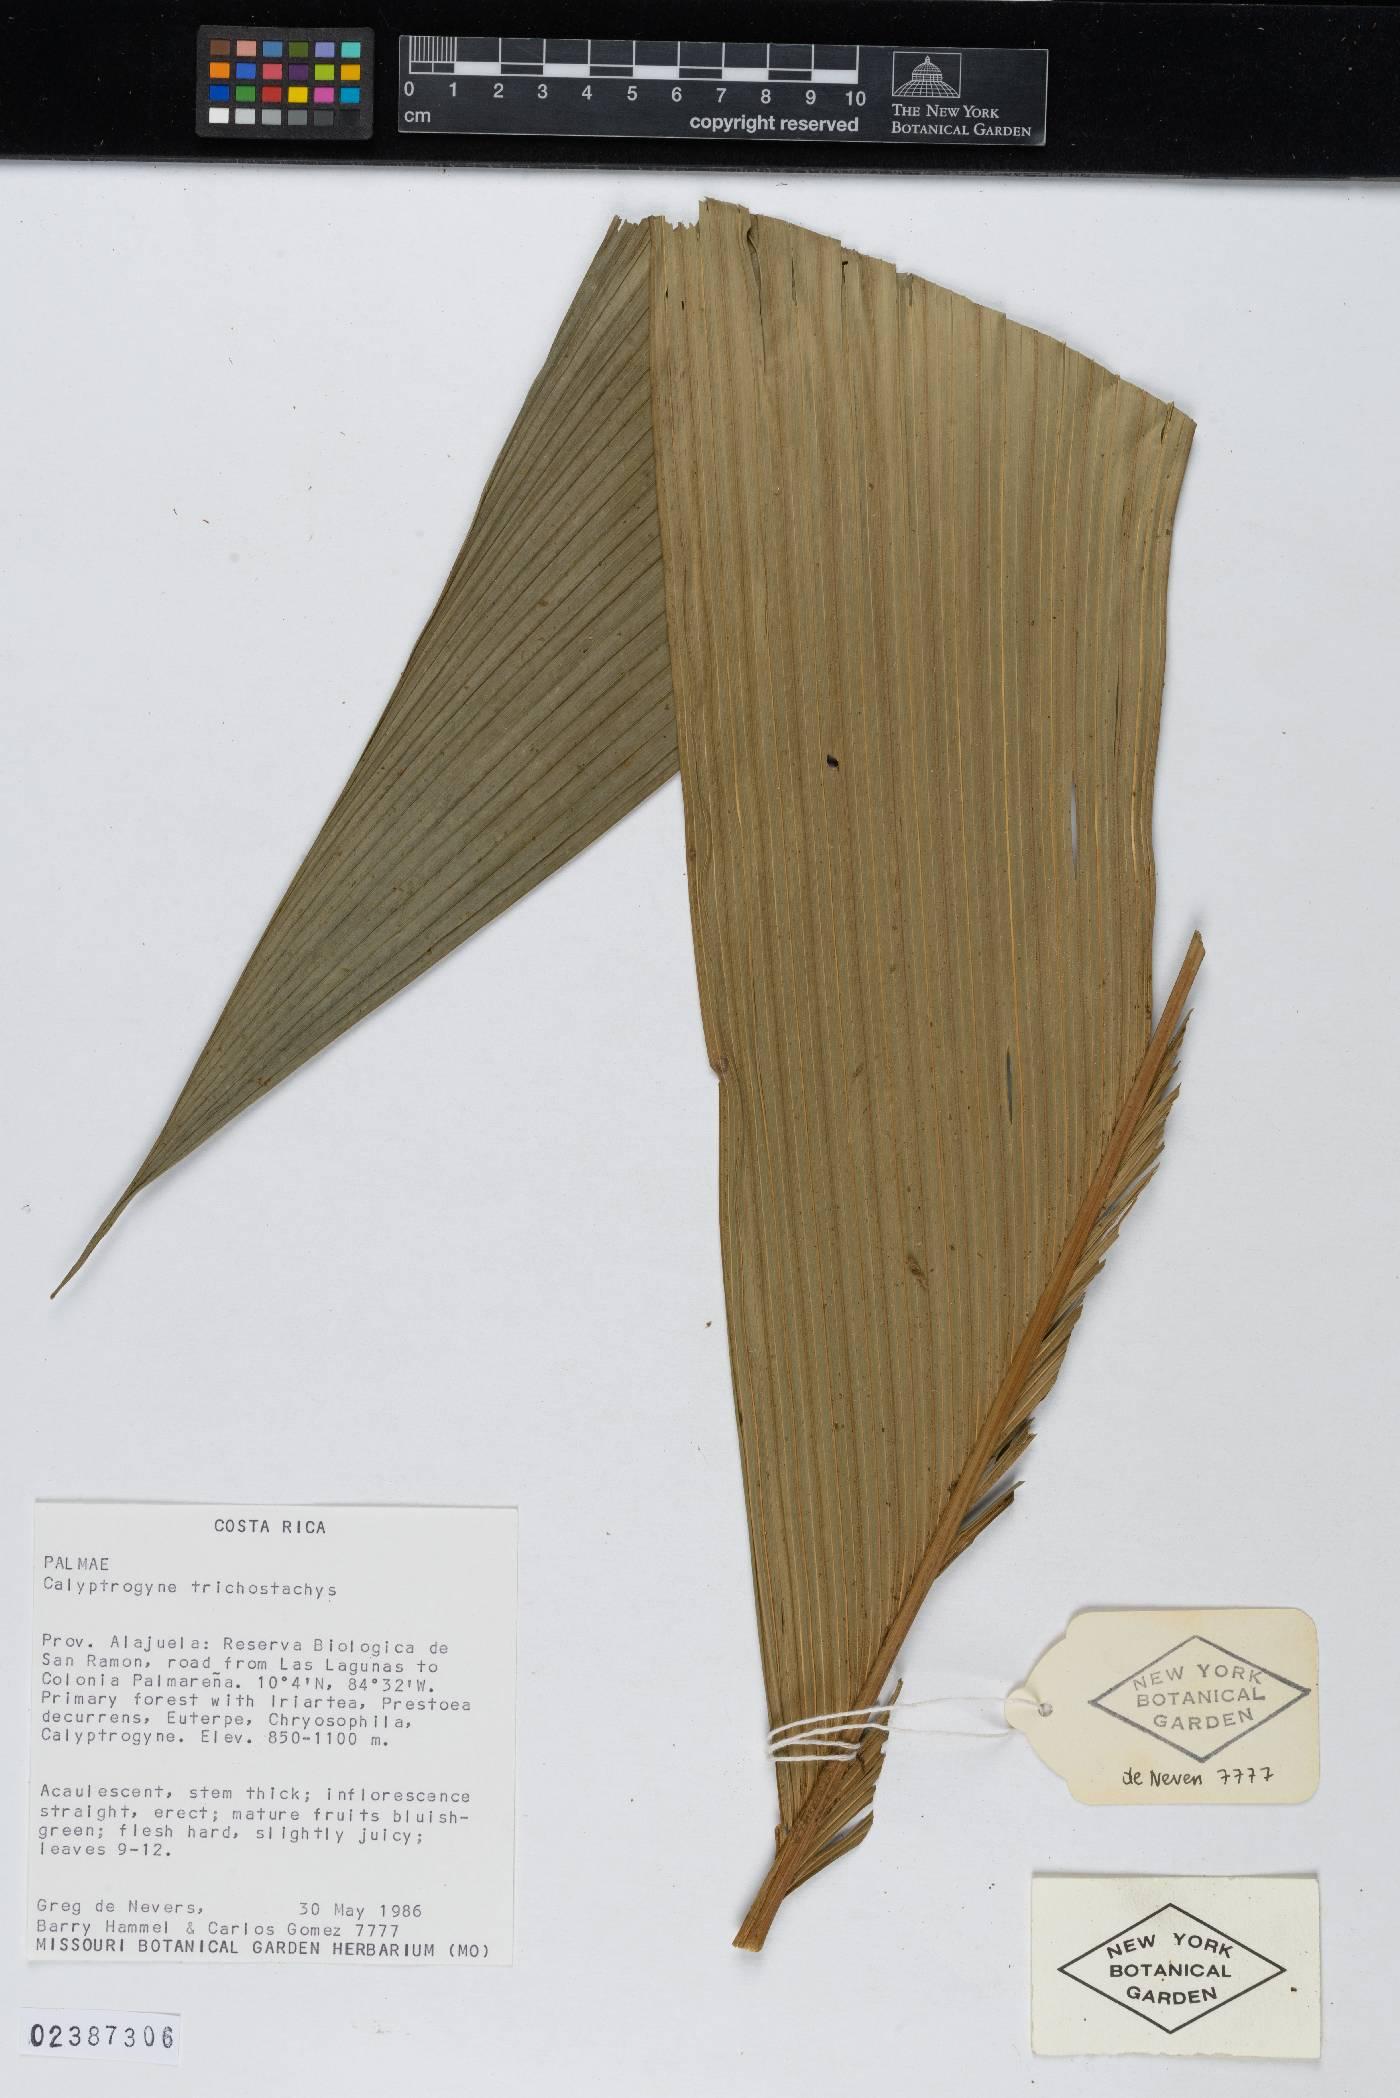 Calyptrogyne trichostachys image